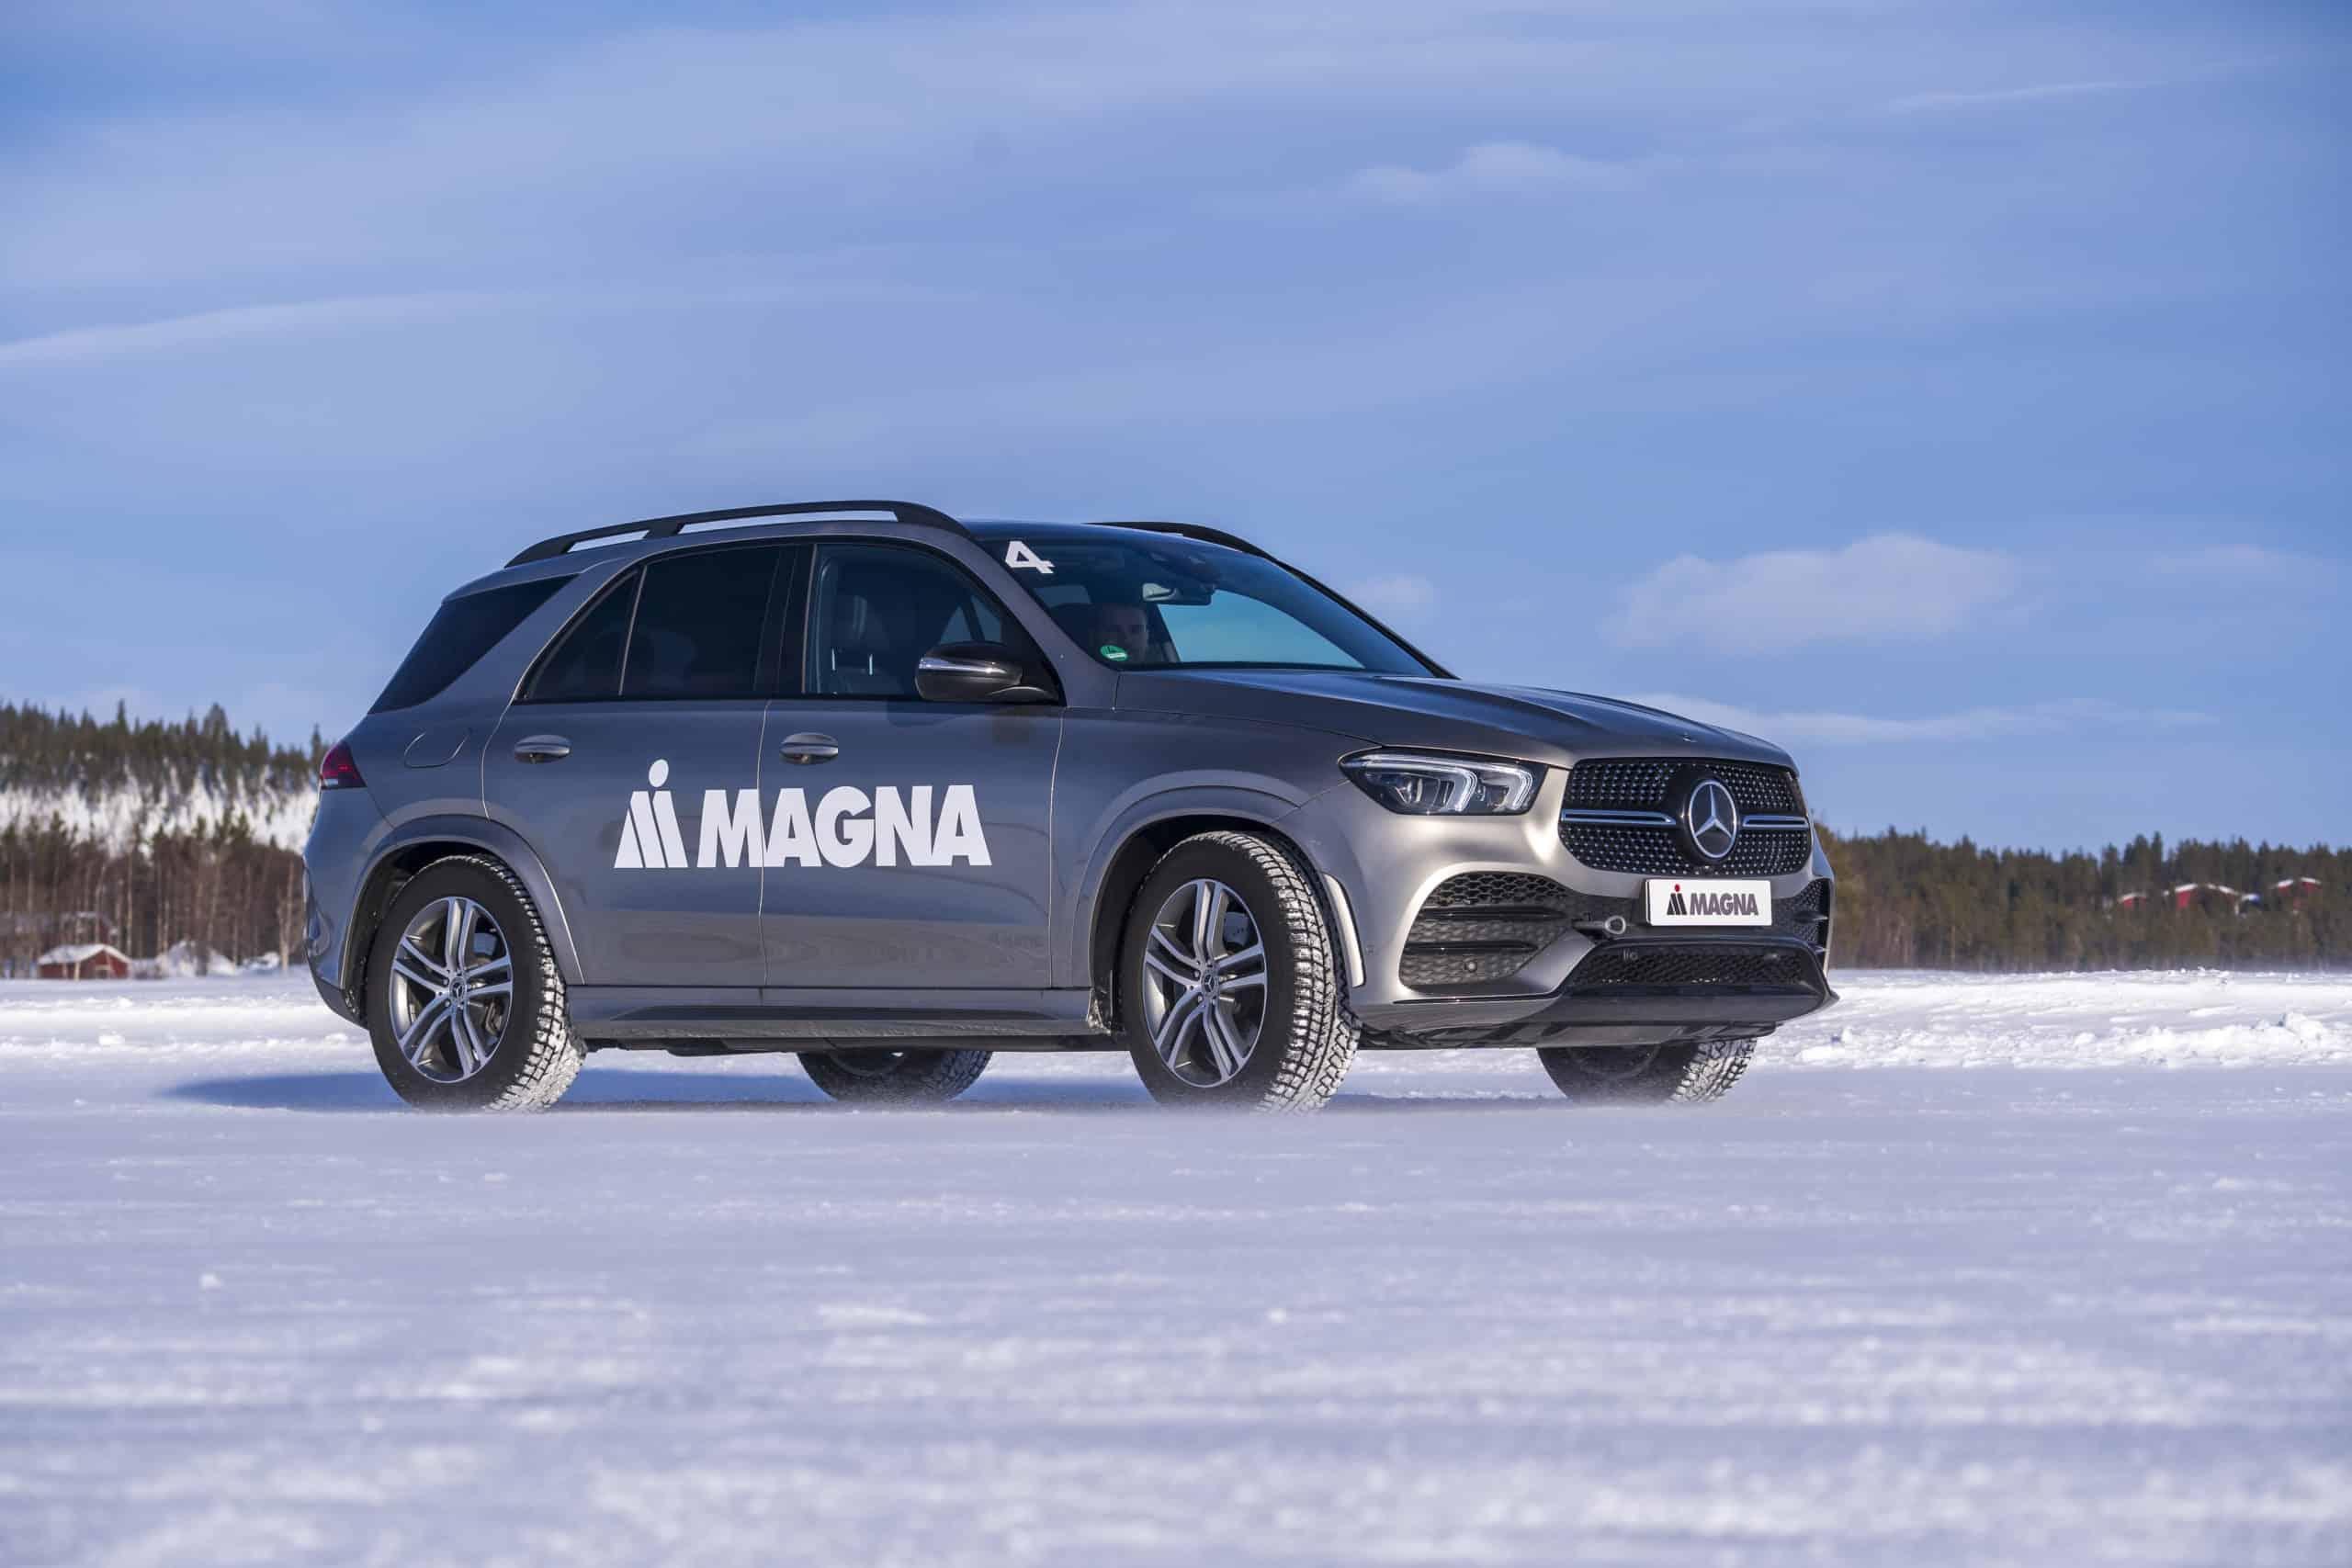 Magna_Mercedes Benz GLE 400_Actimax